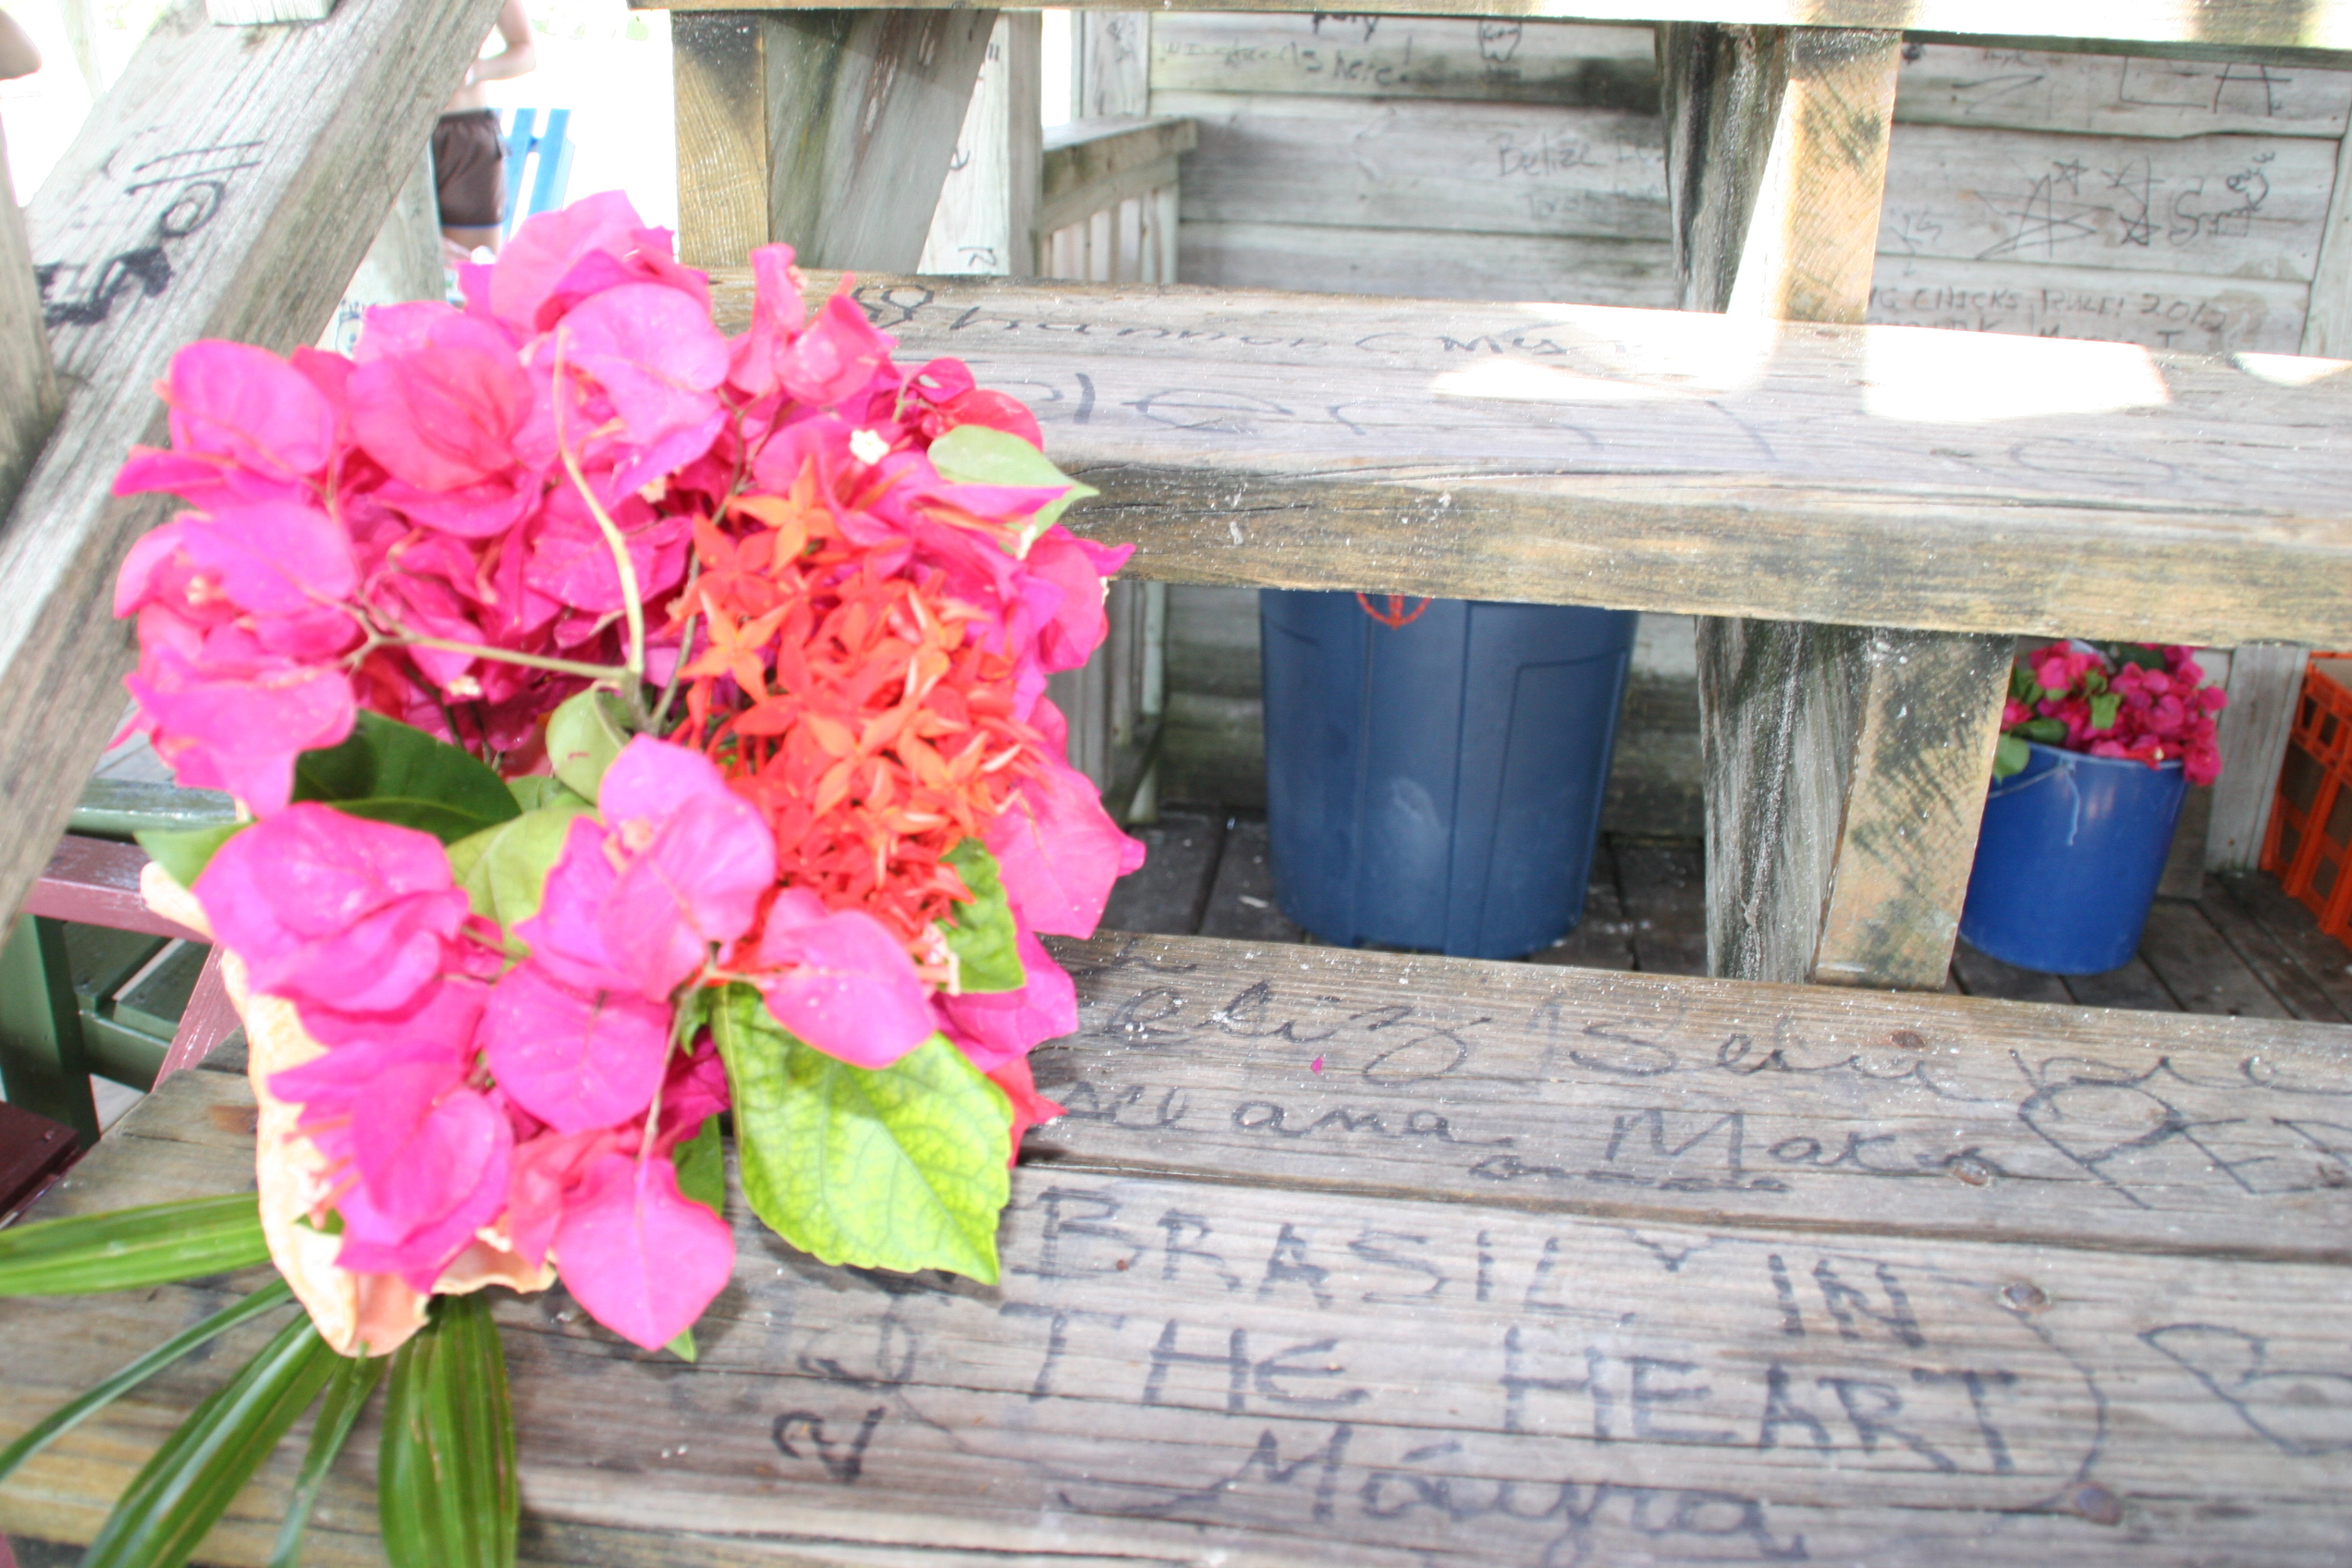 Flowers Ive Seen